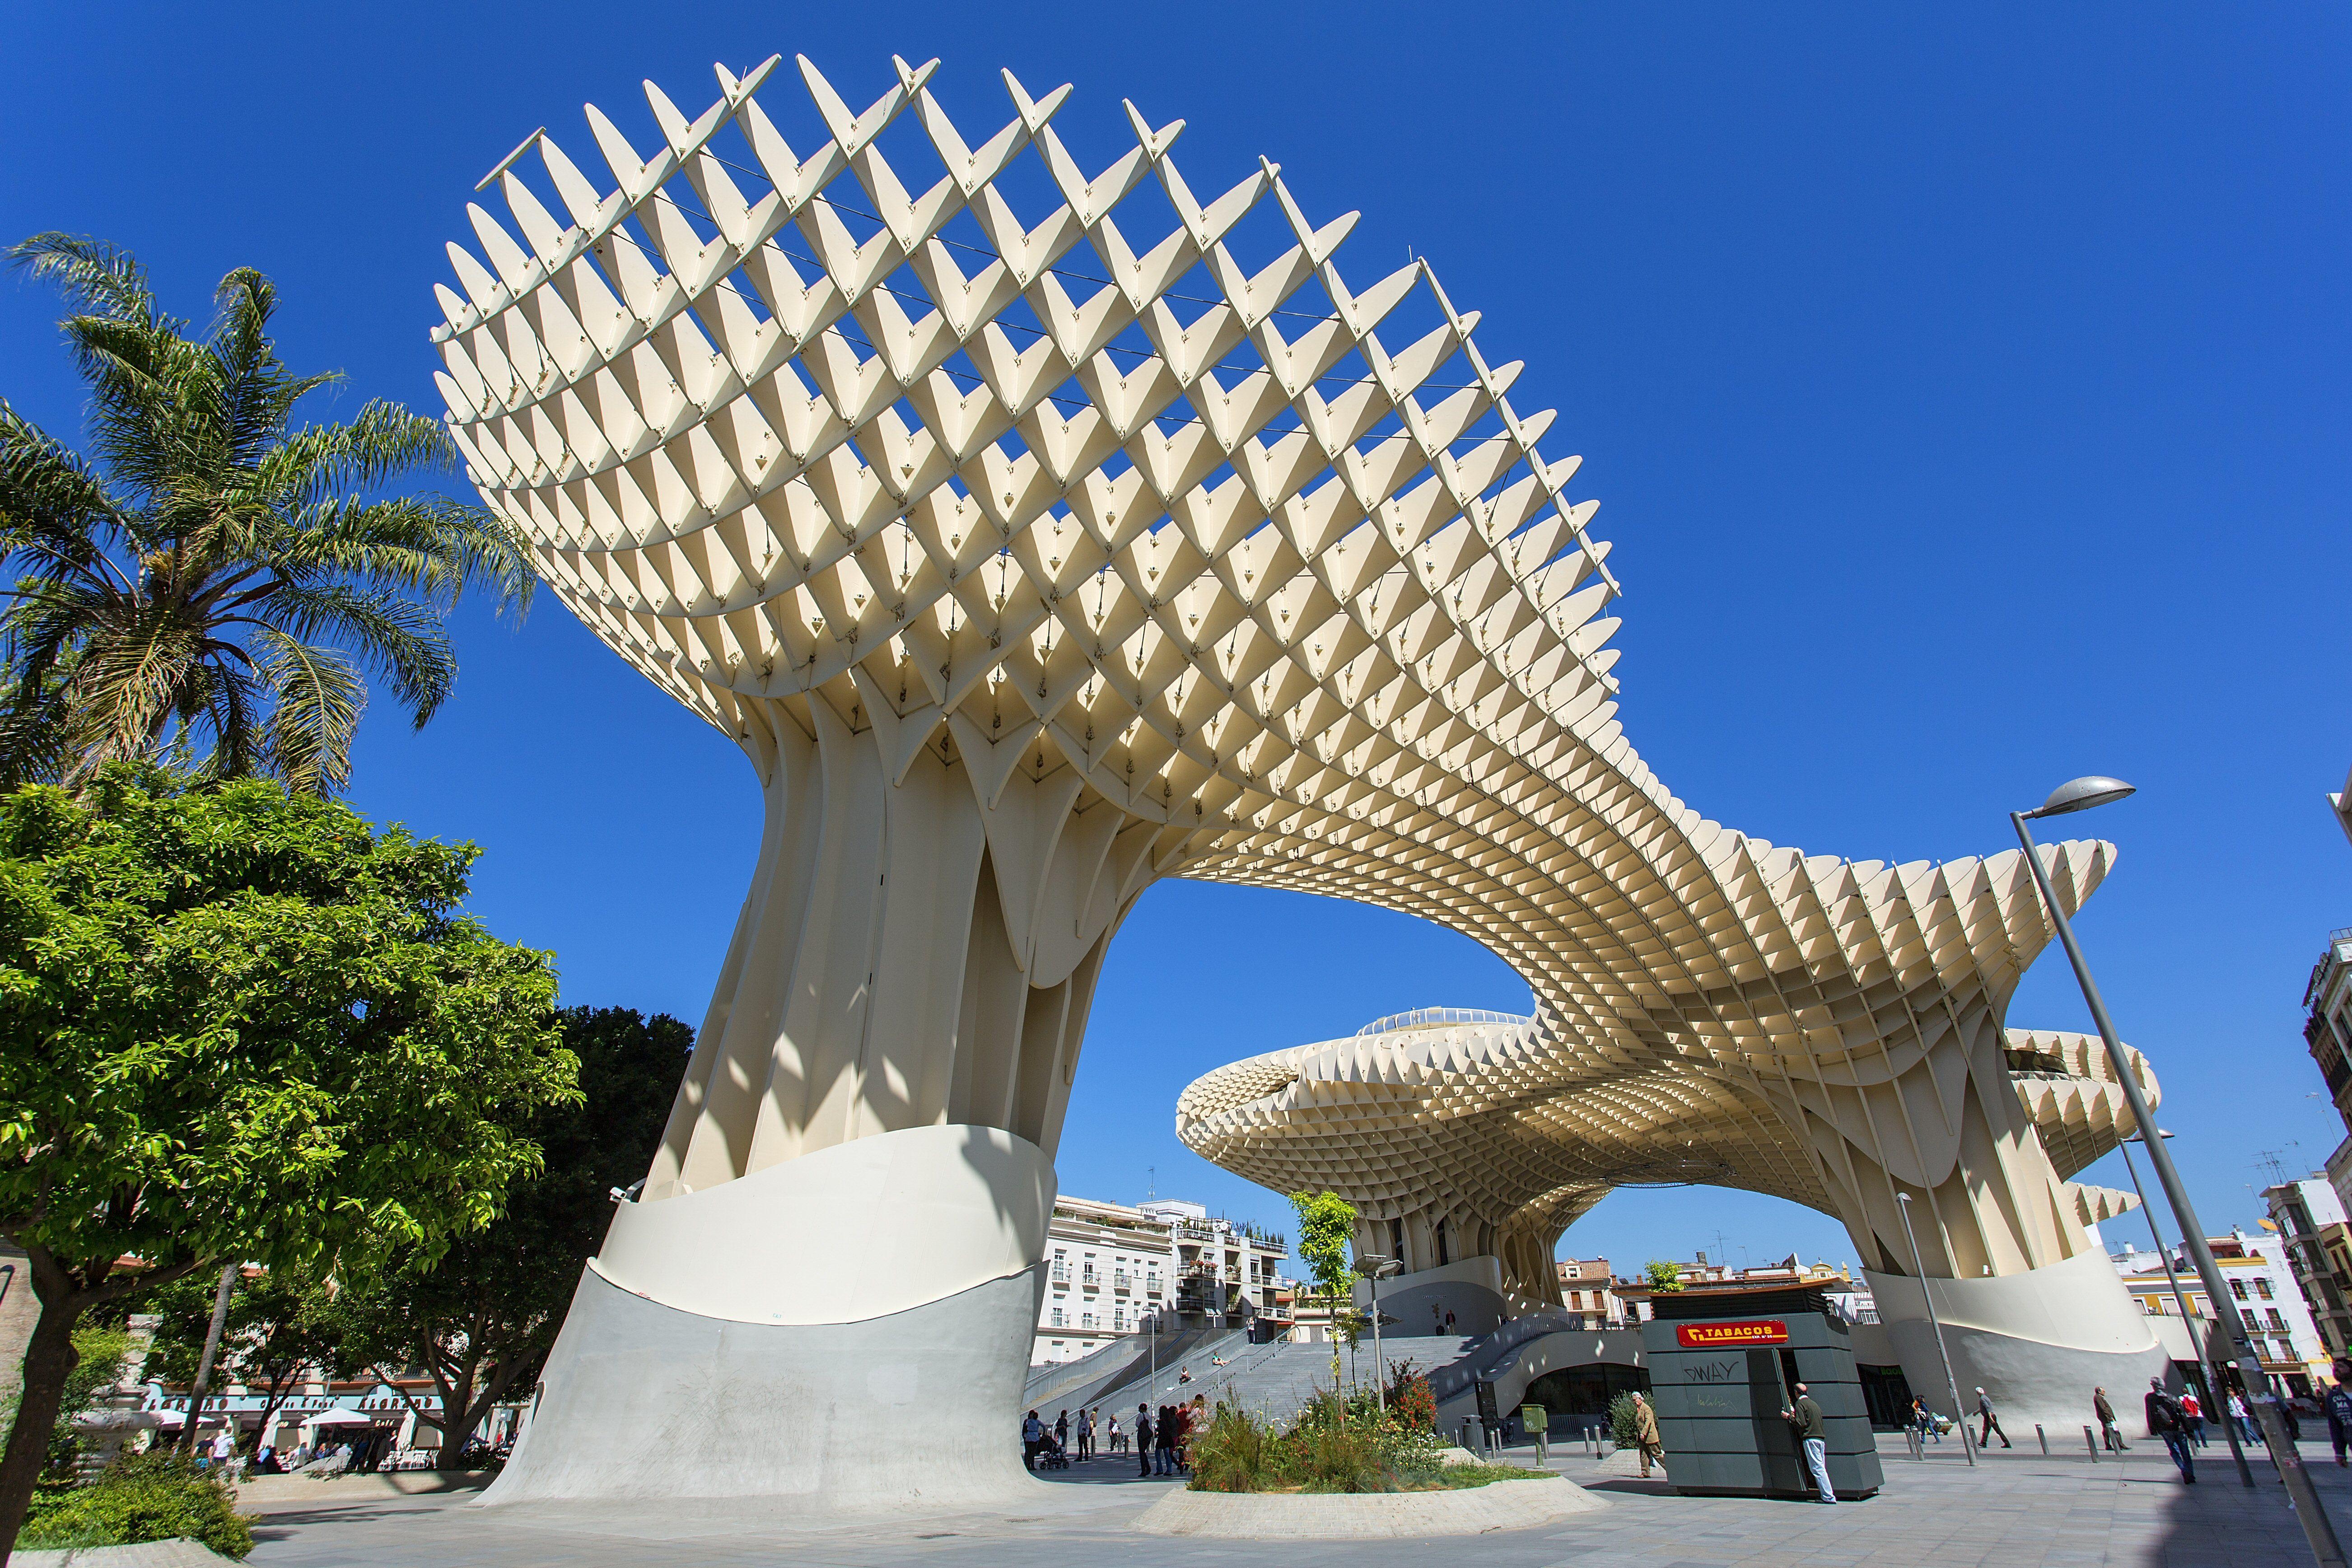 Wooden sculpture-park designed by German Jürgen Mayer-Hermann for Seville, Spain, 2011